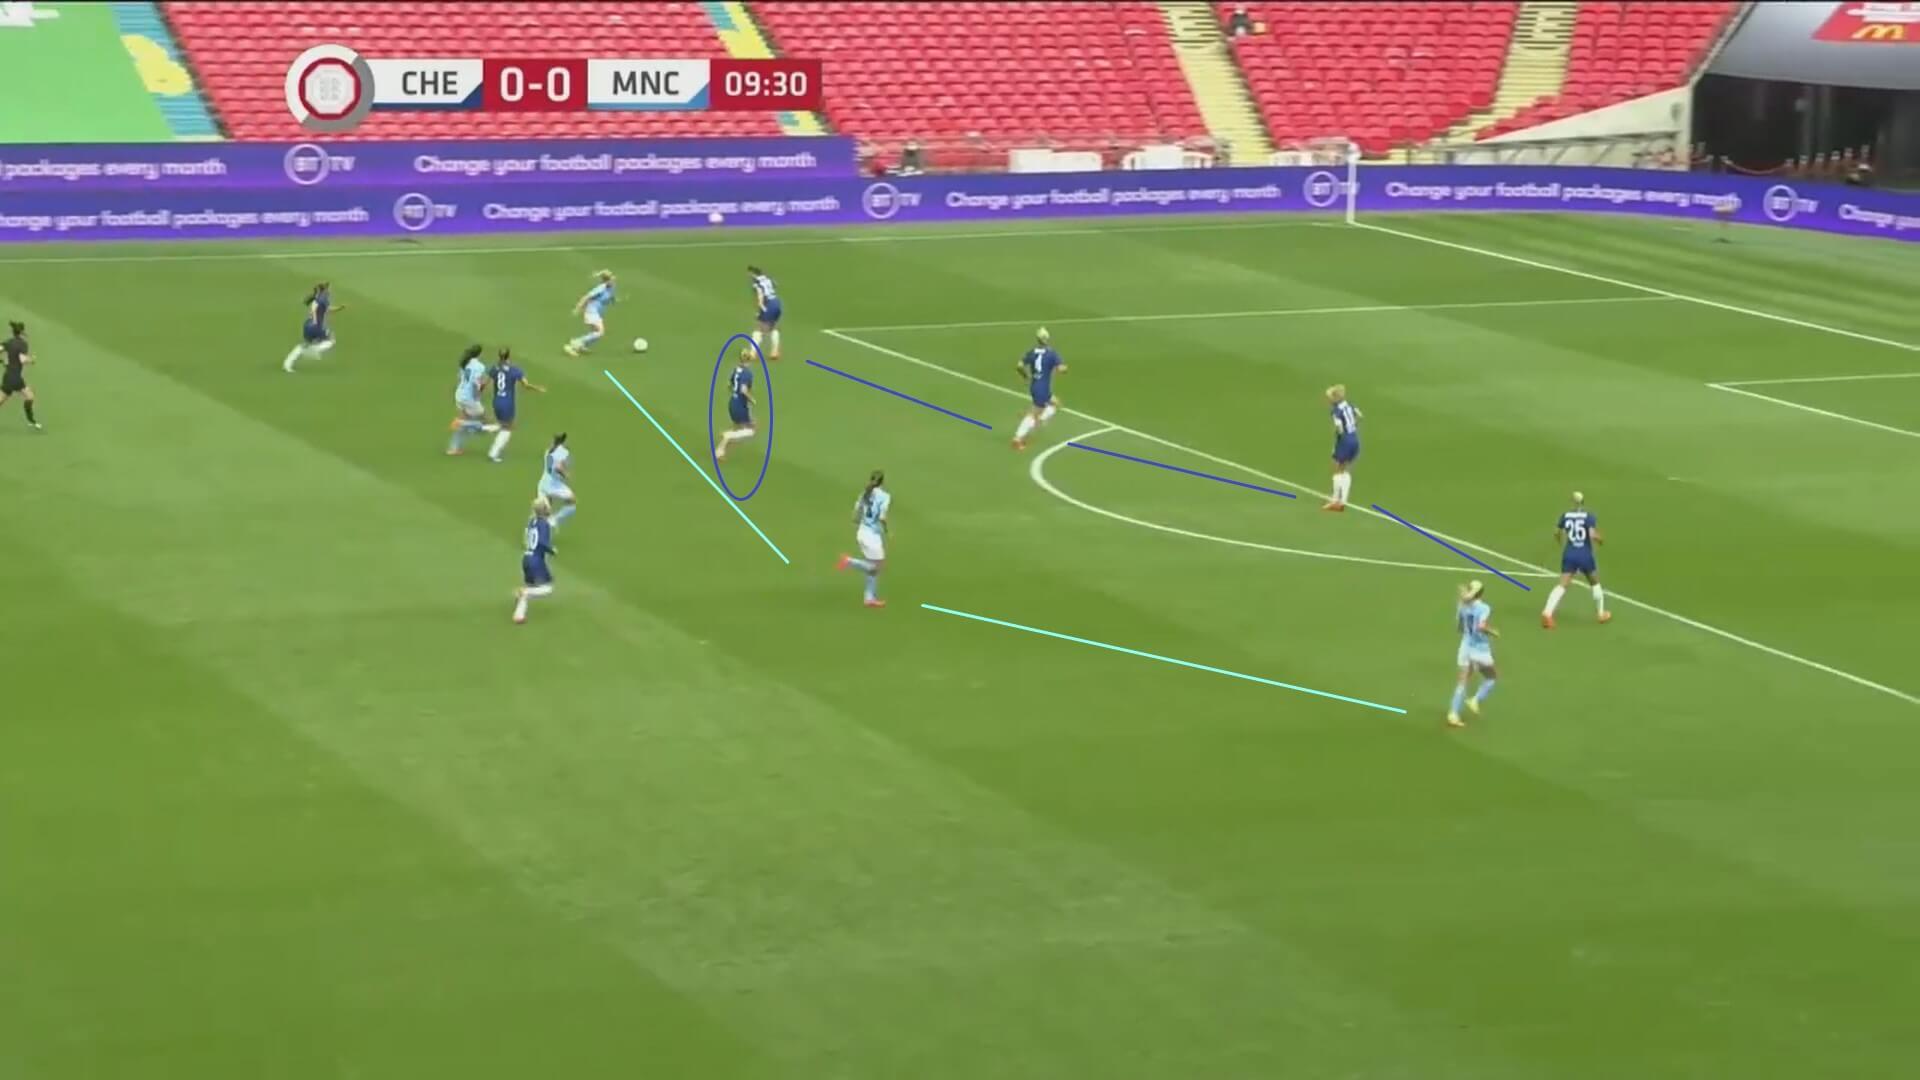 Women's Community Shield 2020: Chelsea Women v Manchester City Women - tactical analysis tactics